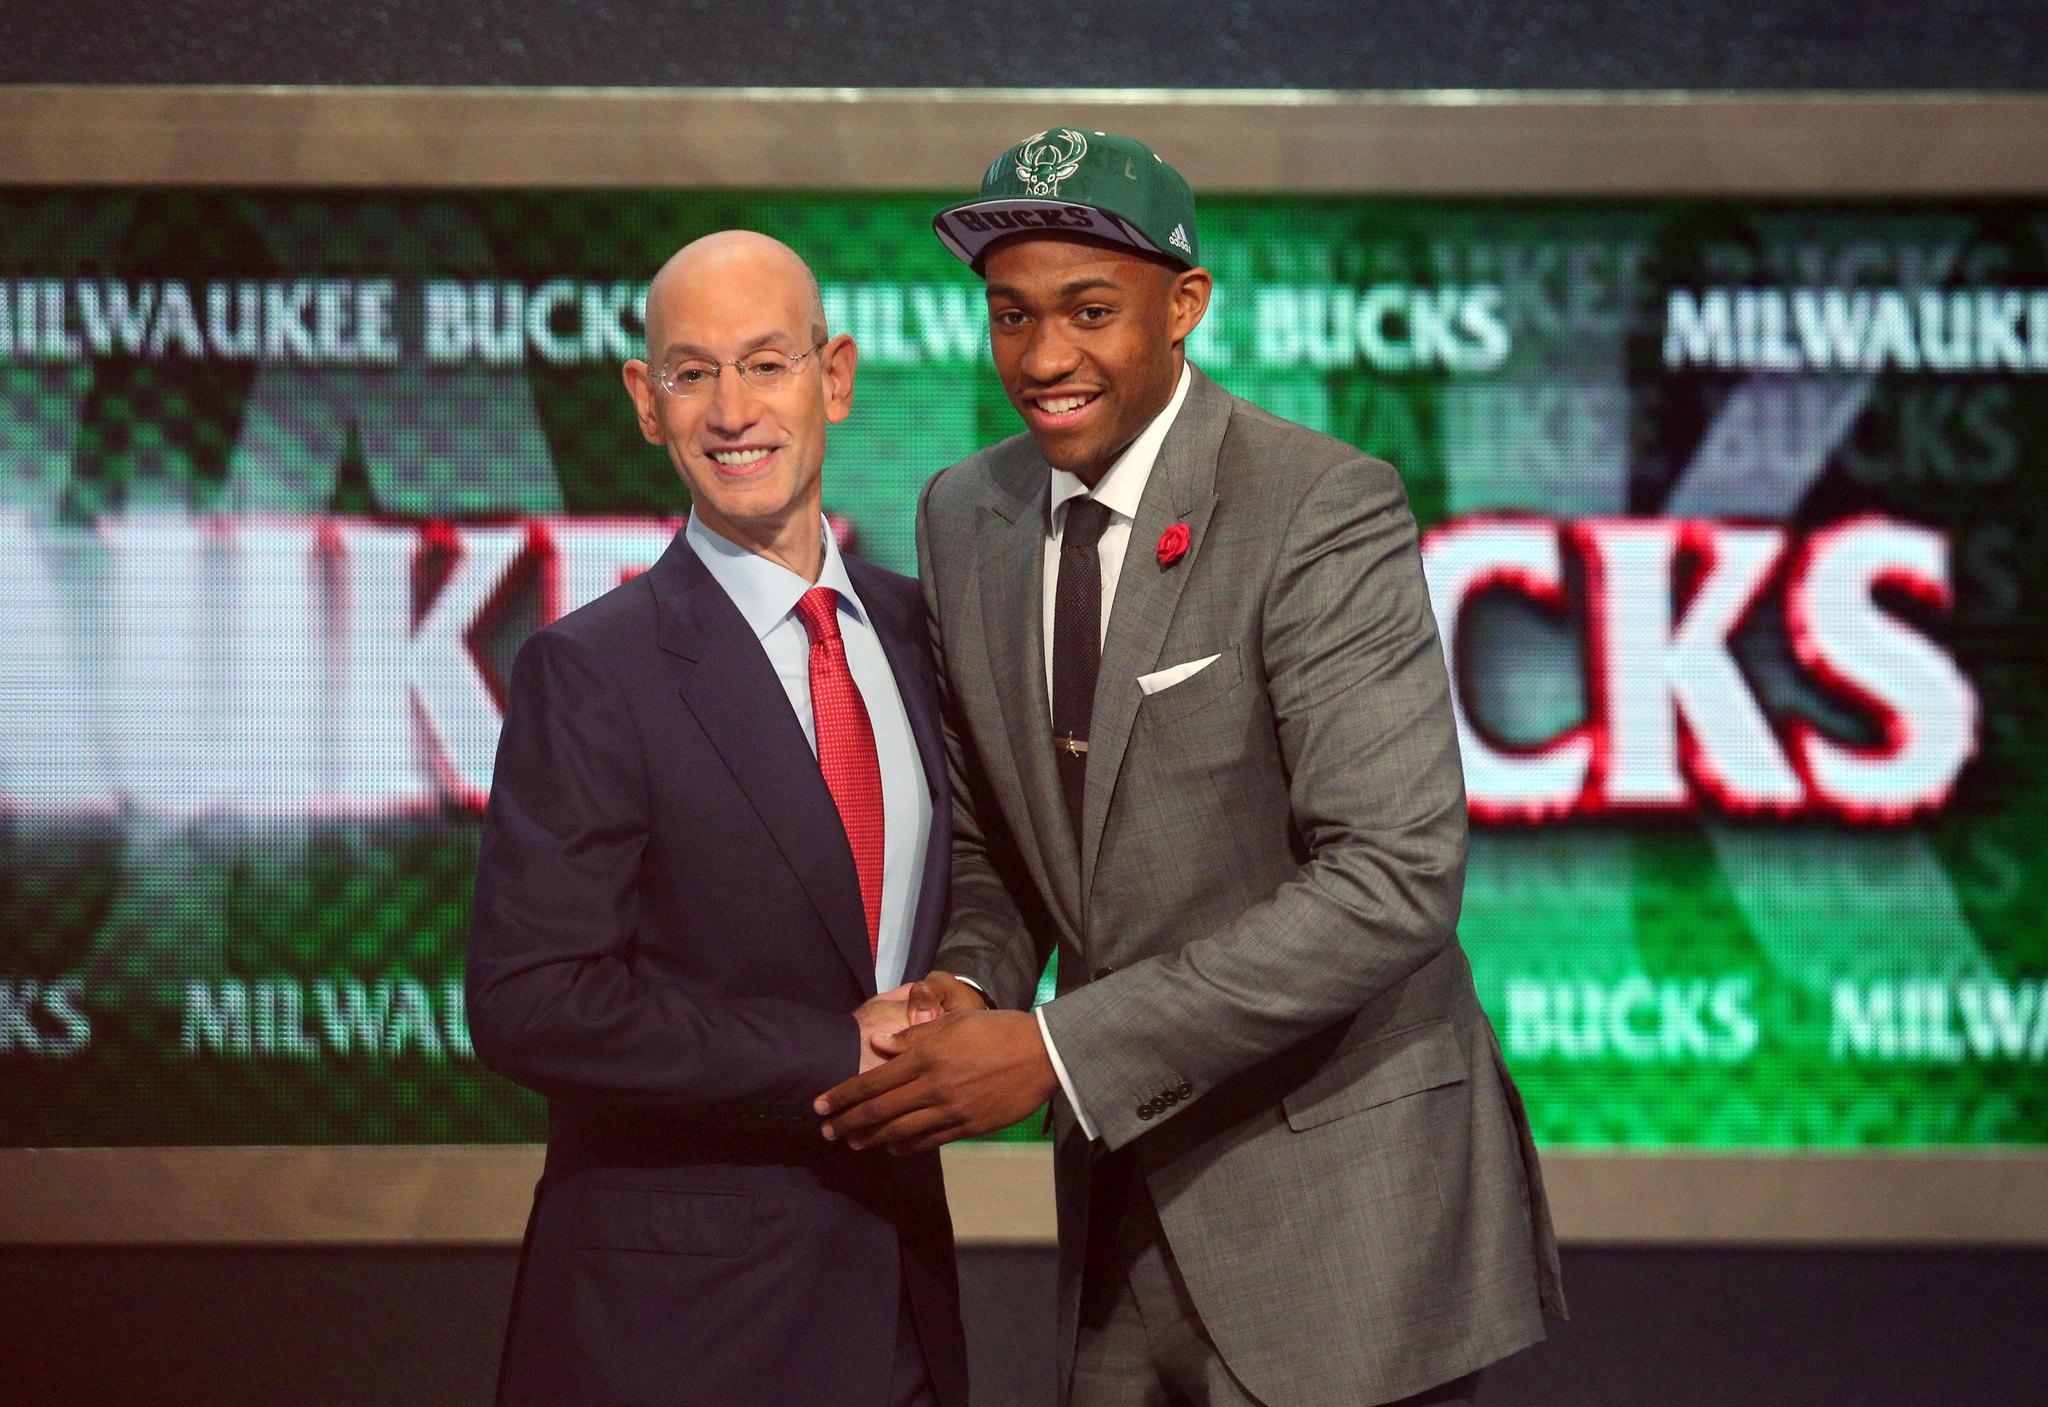 Jabari Parker selected by Bucks with 2nd pick - Chicago ... Jabari Parker Nba Draft